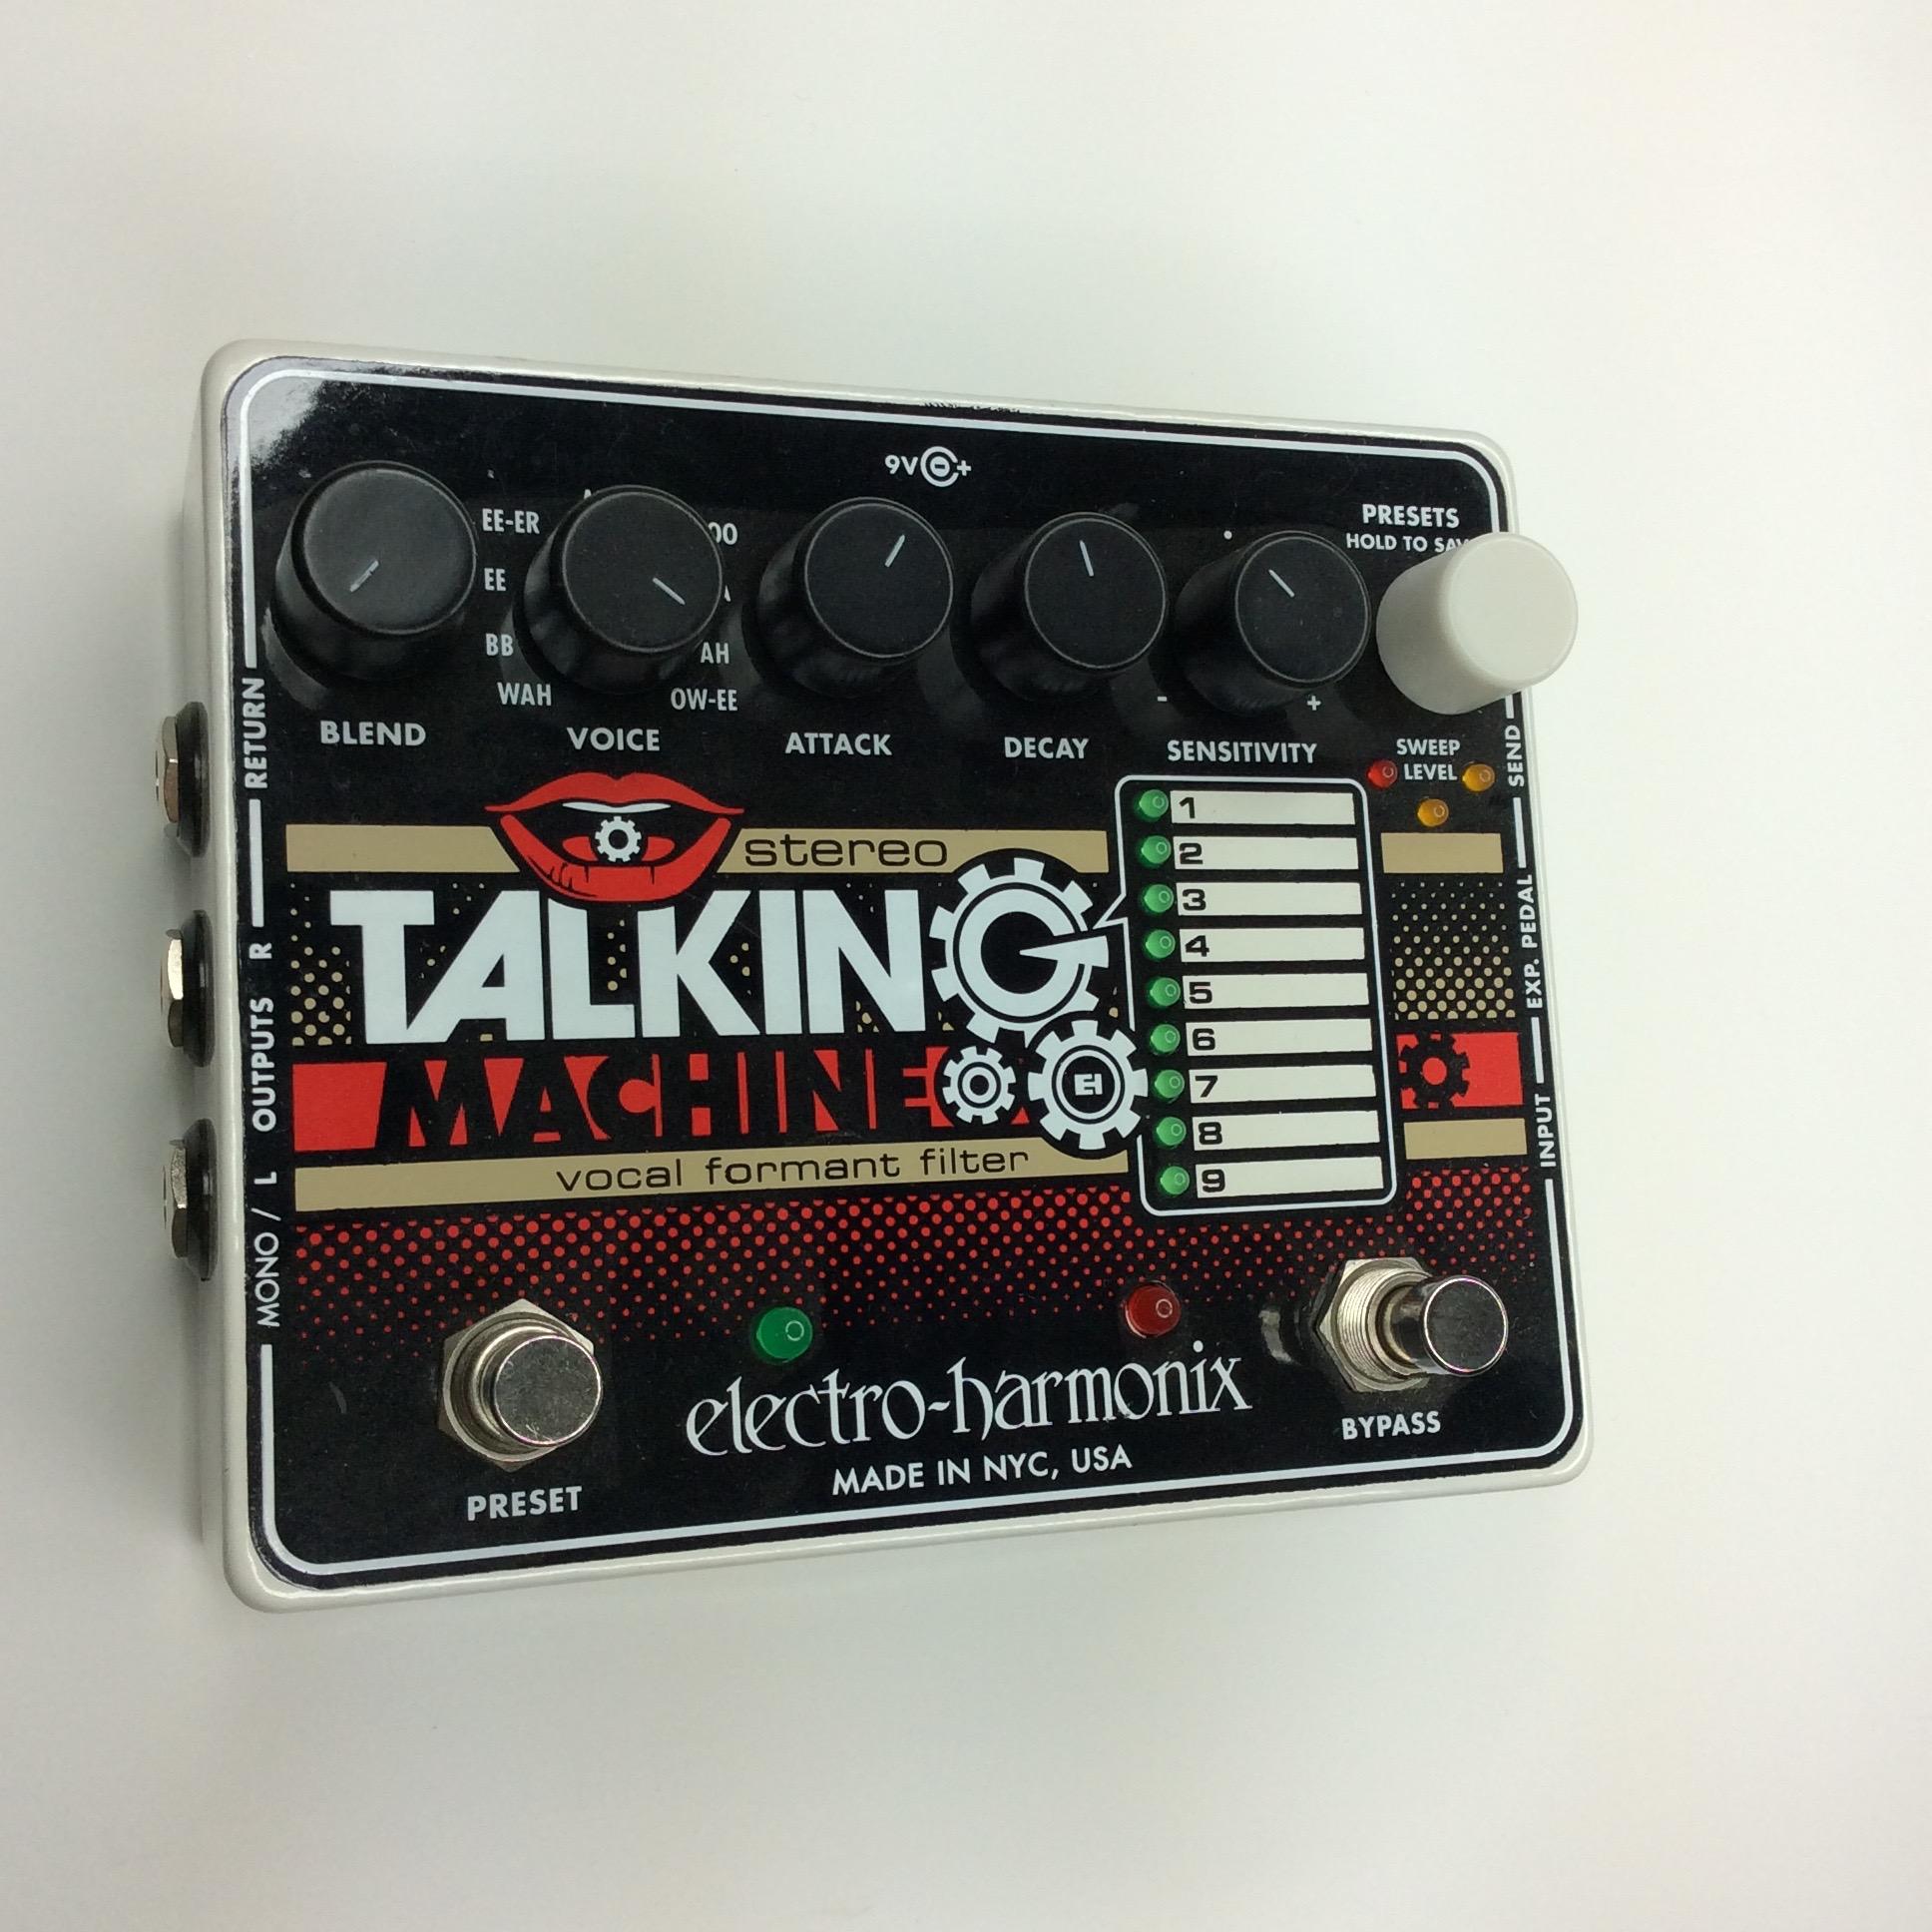 Stereo Talking Machine  Make: electro-harmonix